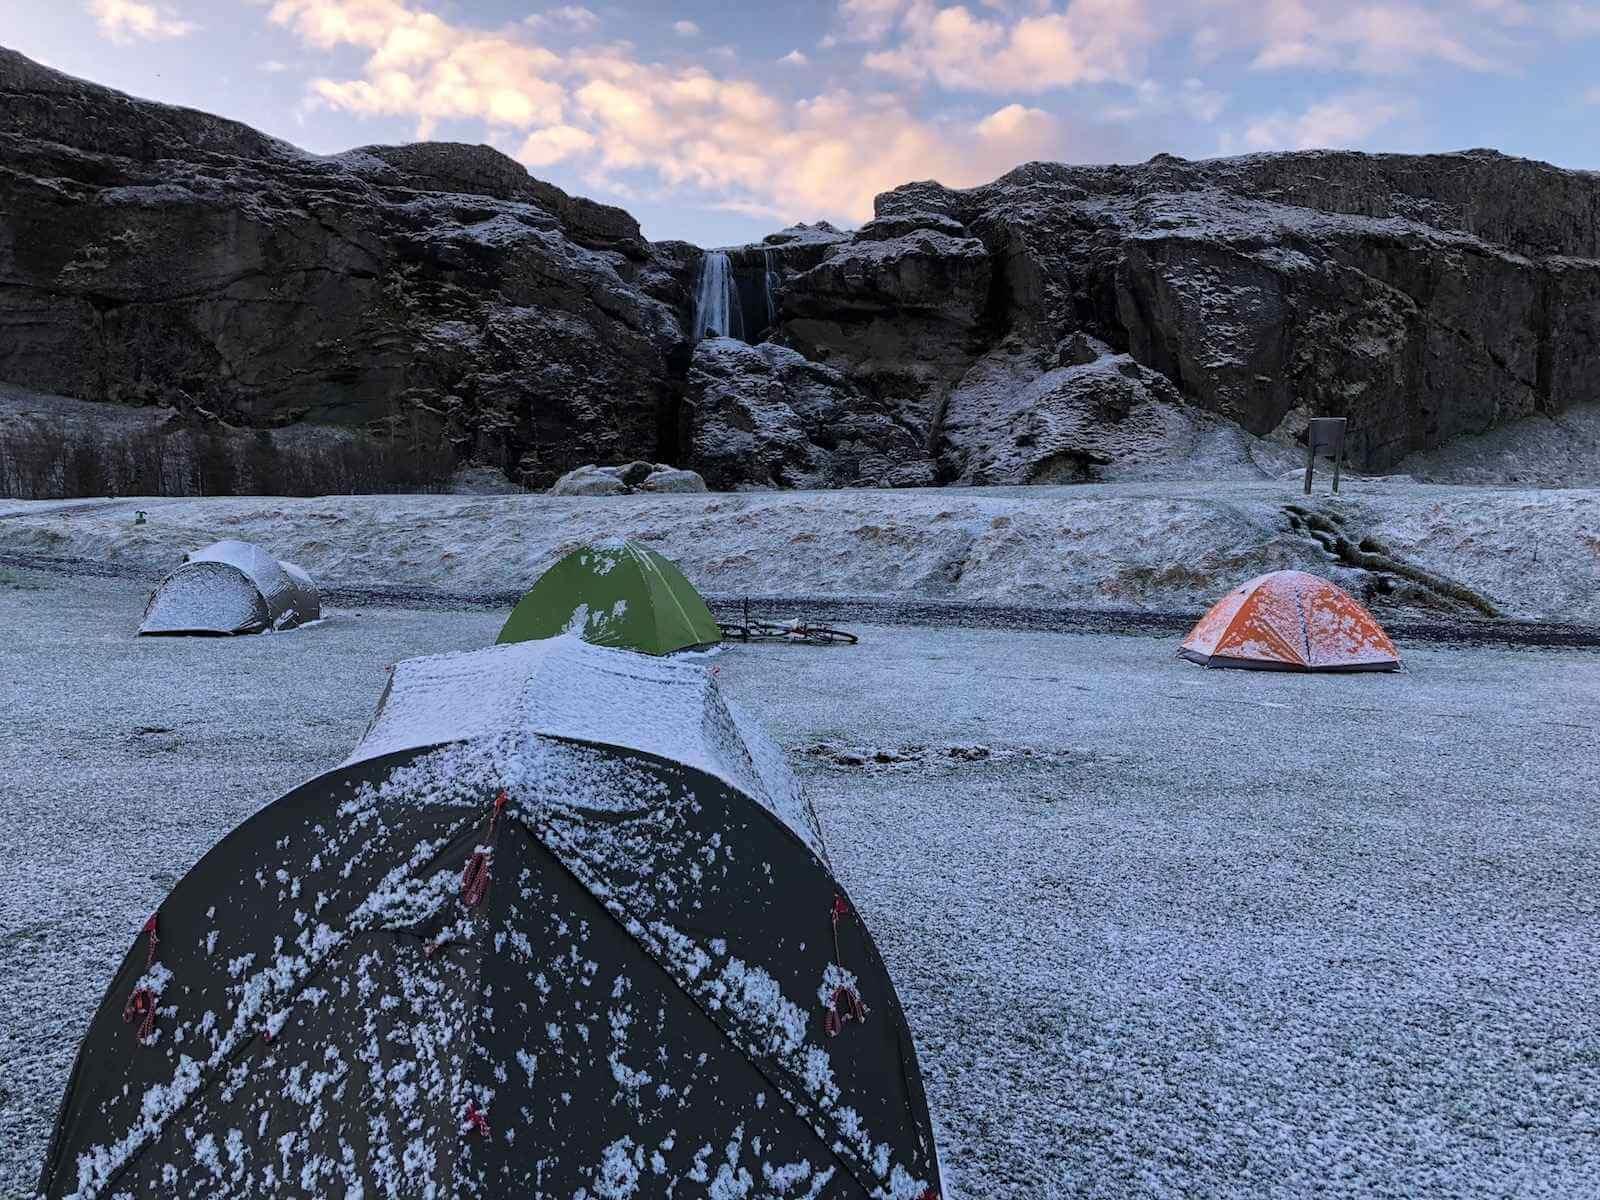 kamperen in ijsland is goedkoper